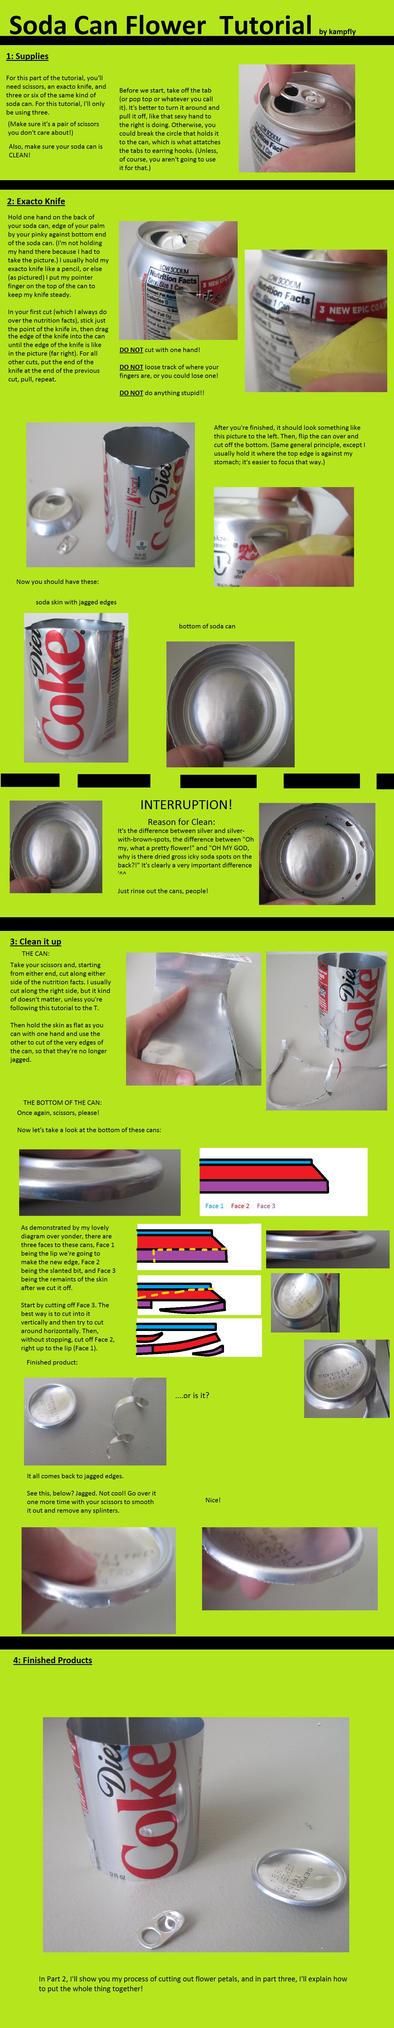 Soda Flower tutorial pt 1 by kampfly